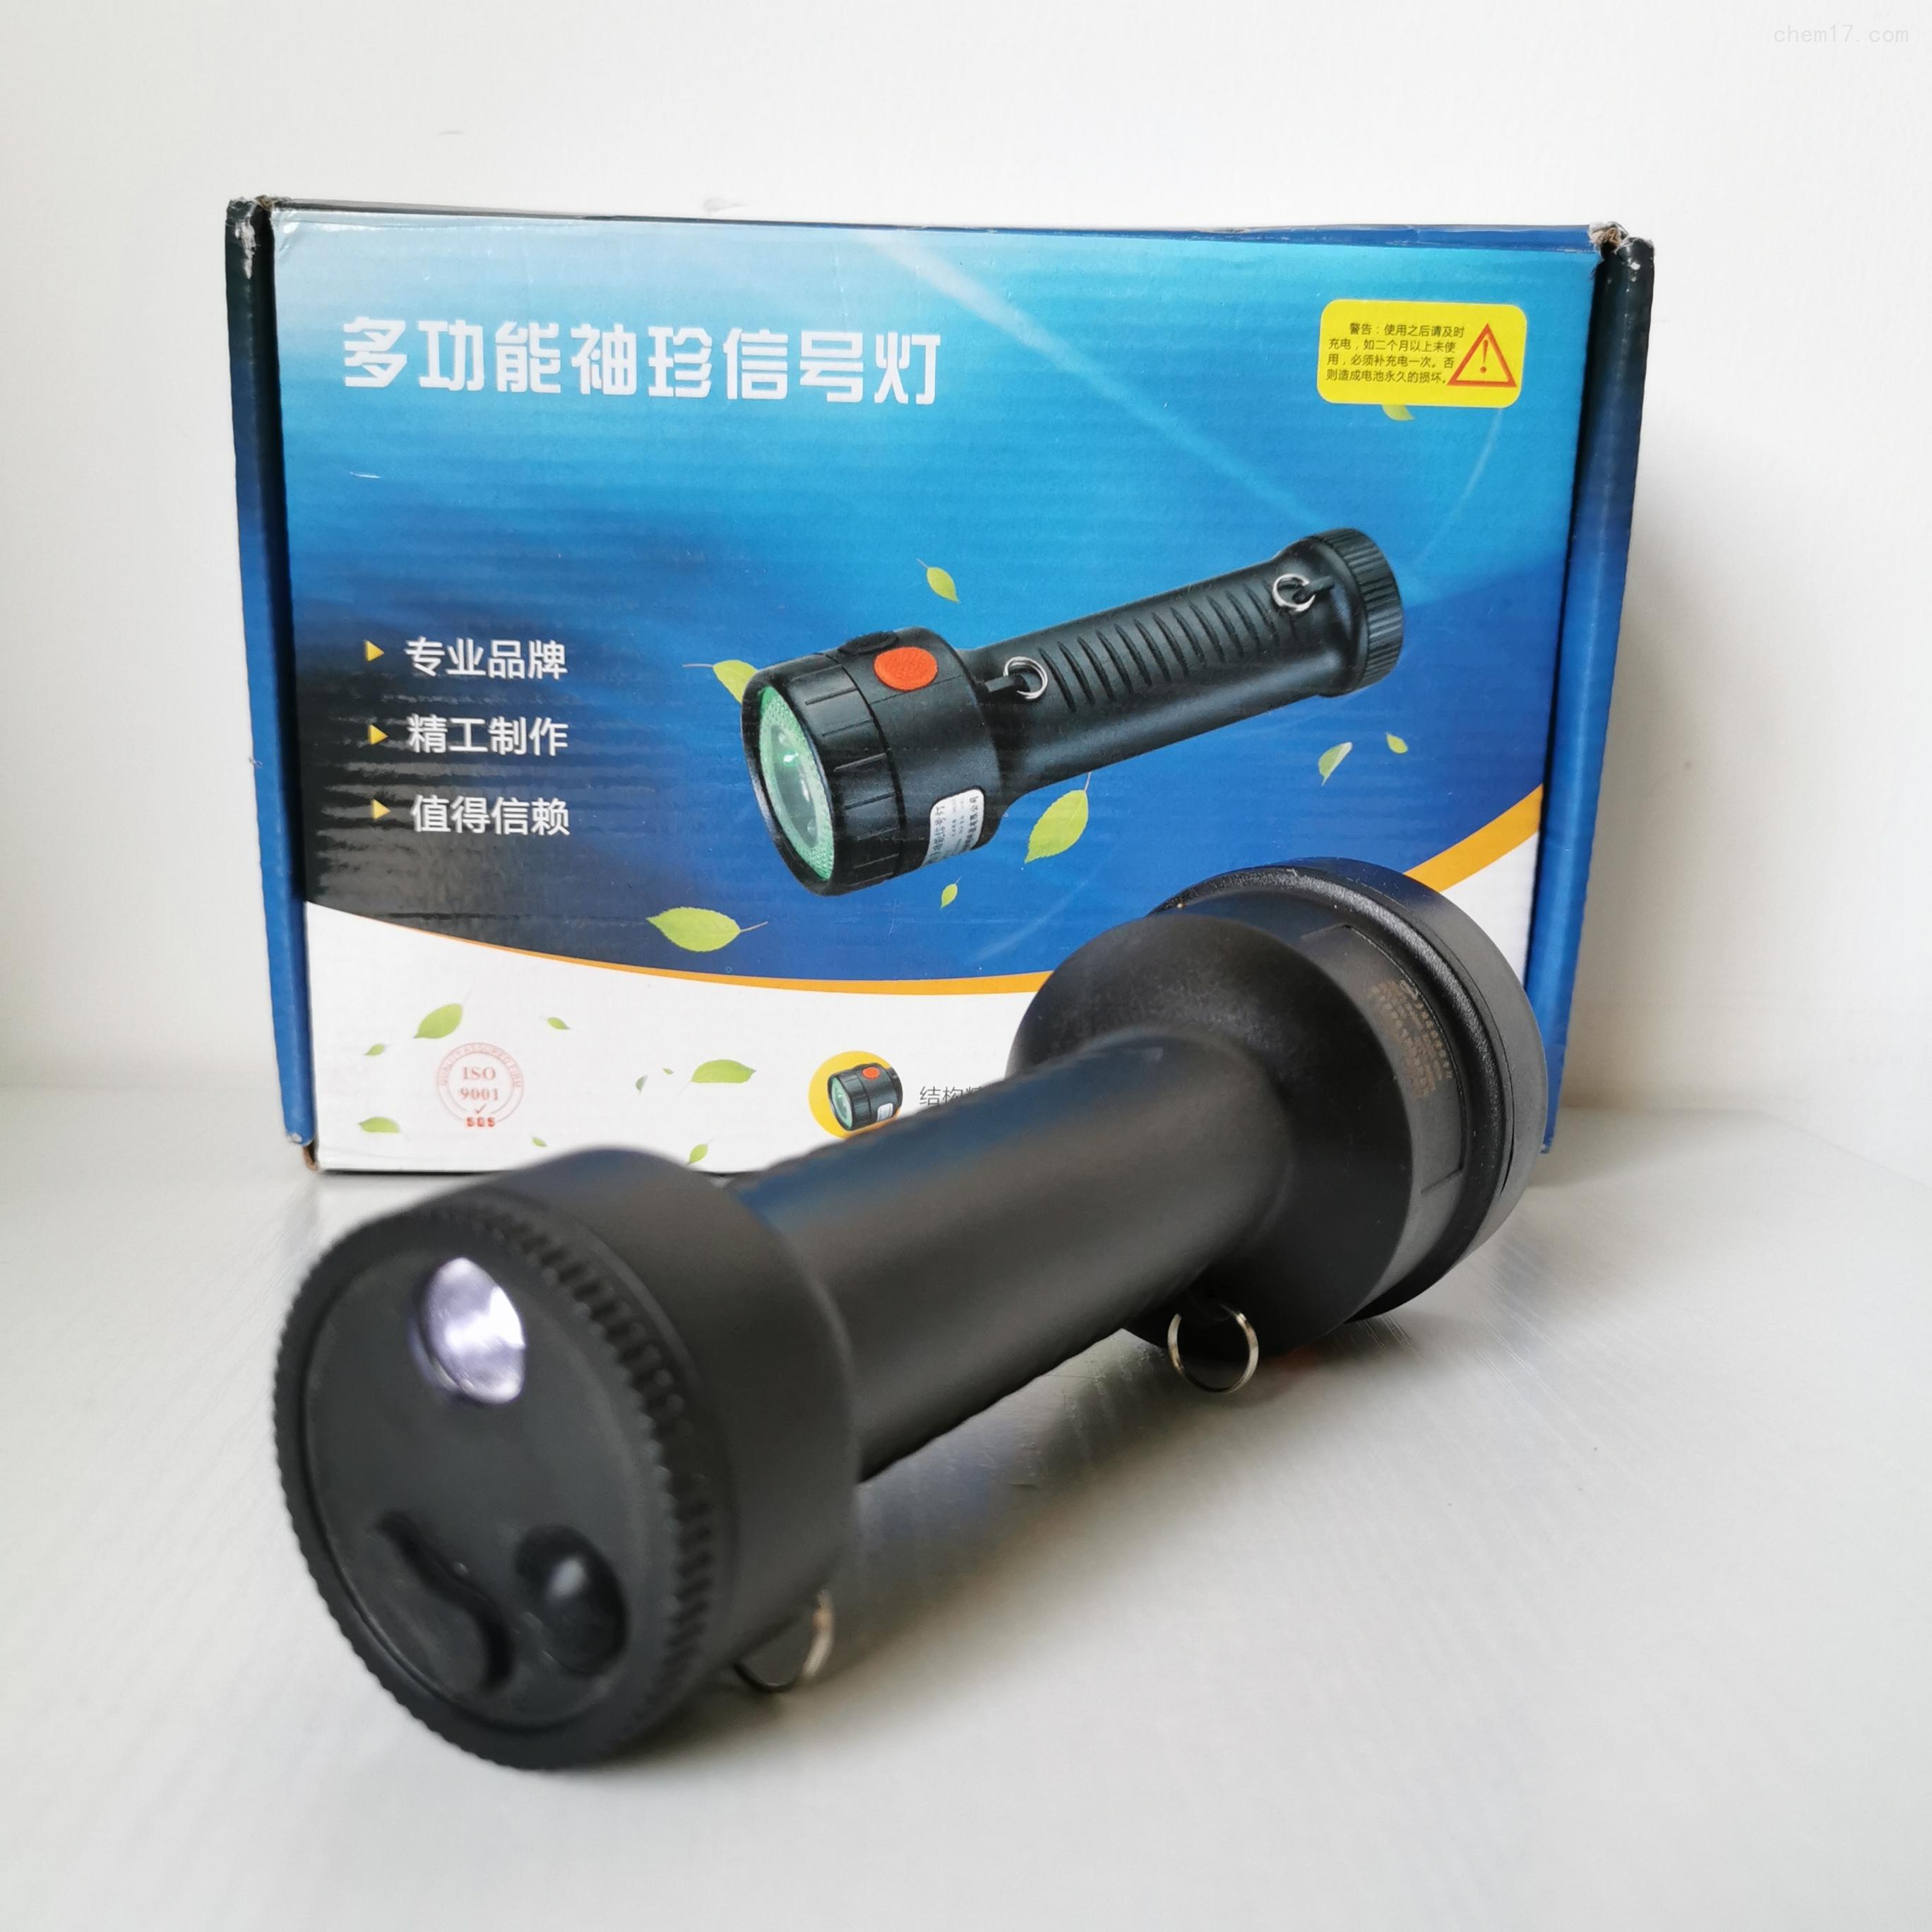 JW7500固态免维护强光防爆电筒IP65